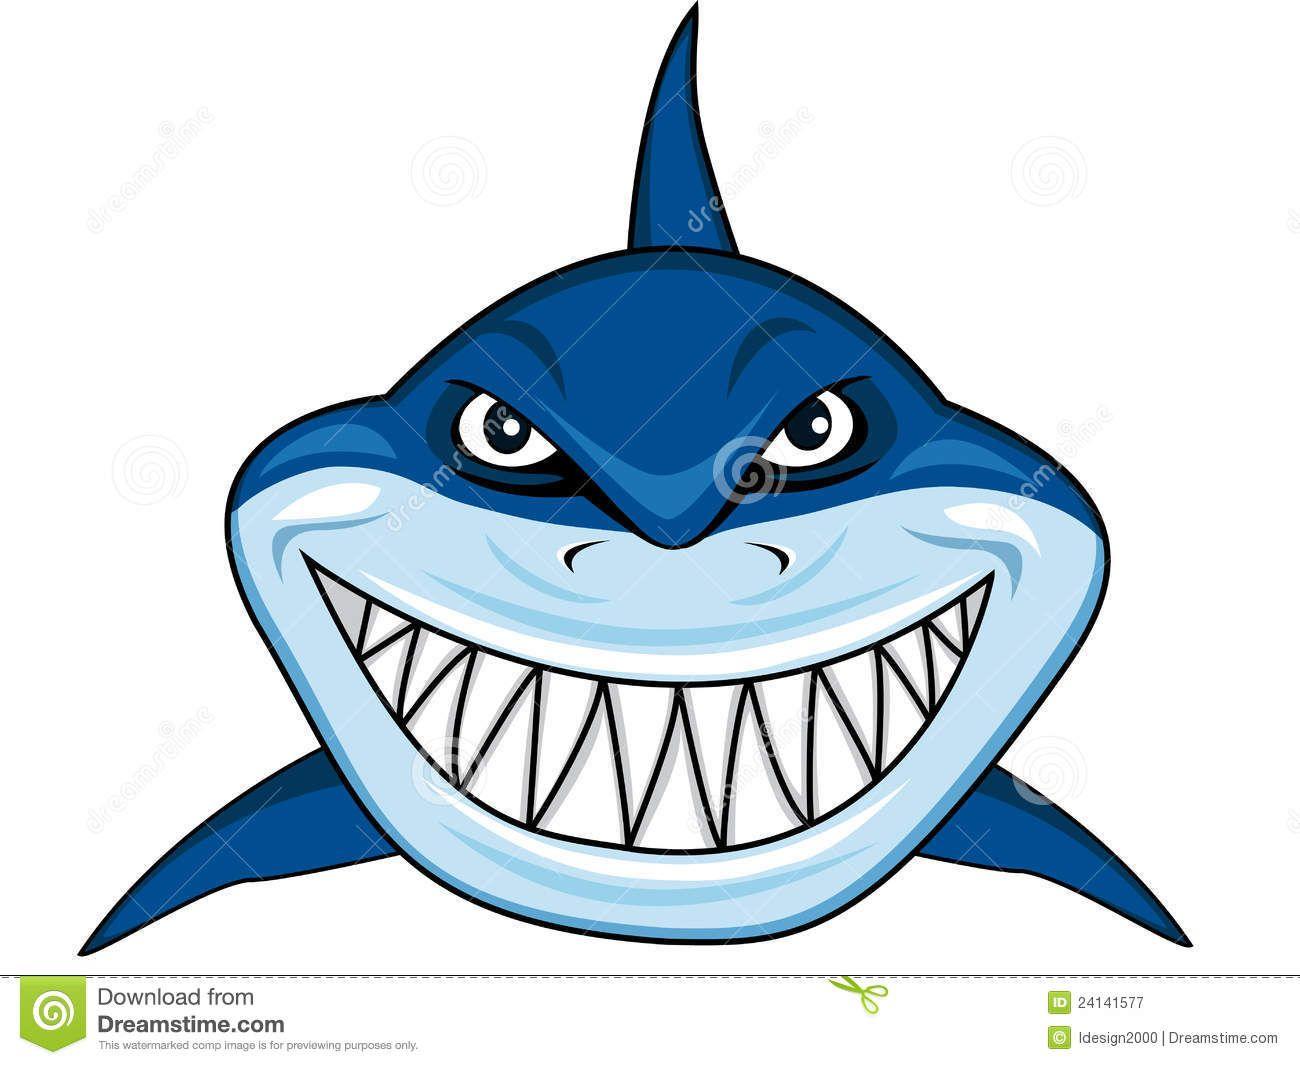 free vector clipart shark no sign up cartoon